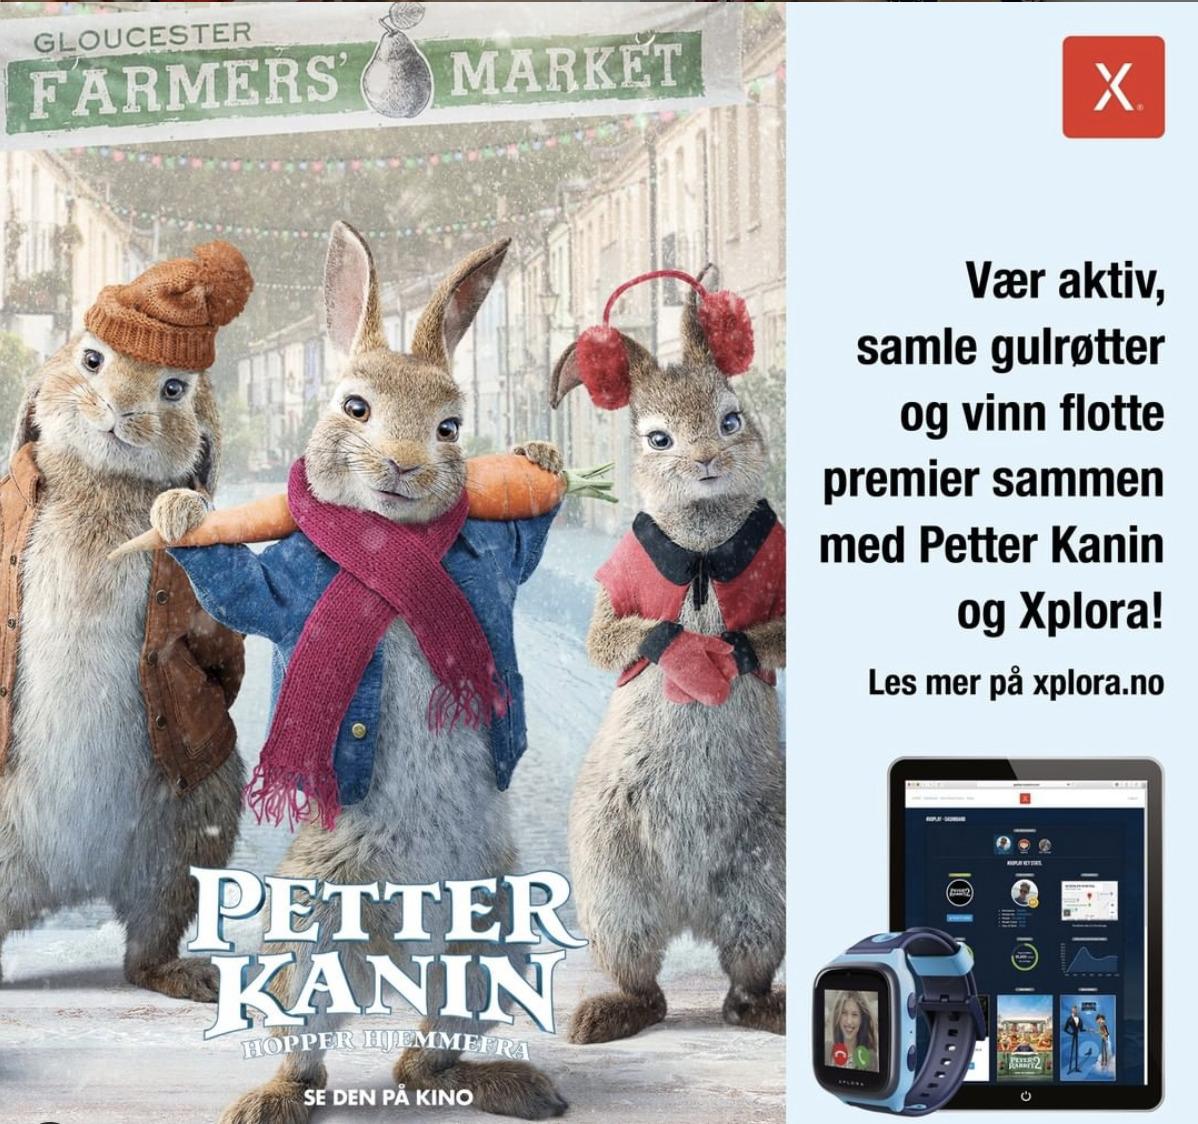 petter-kanin-annonse